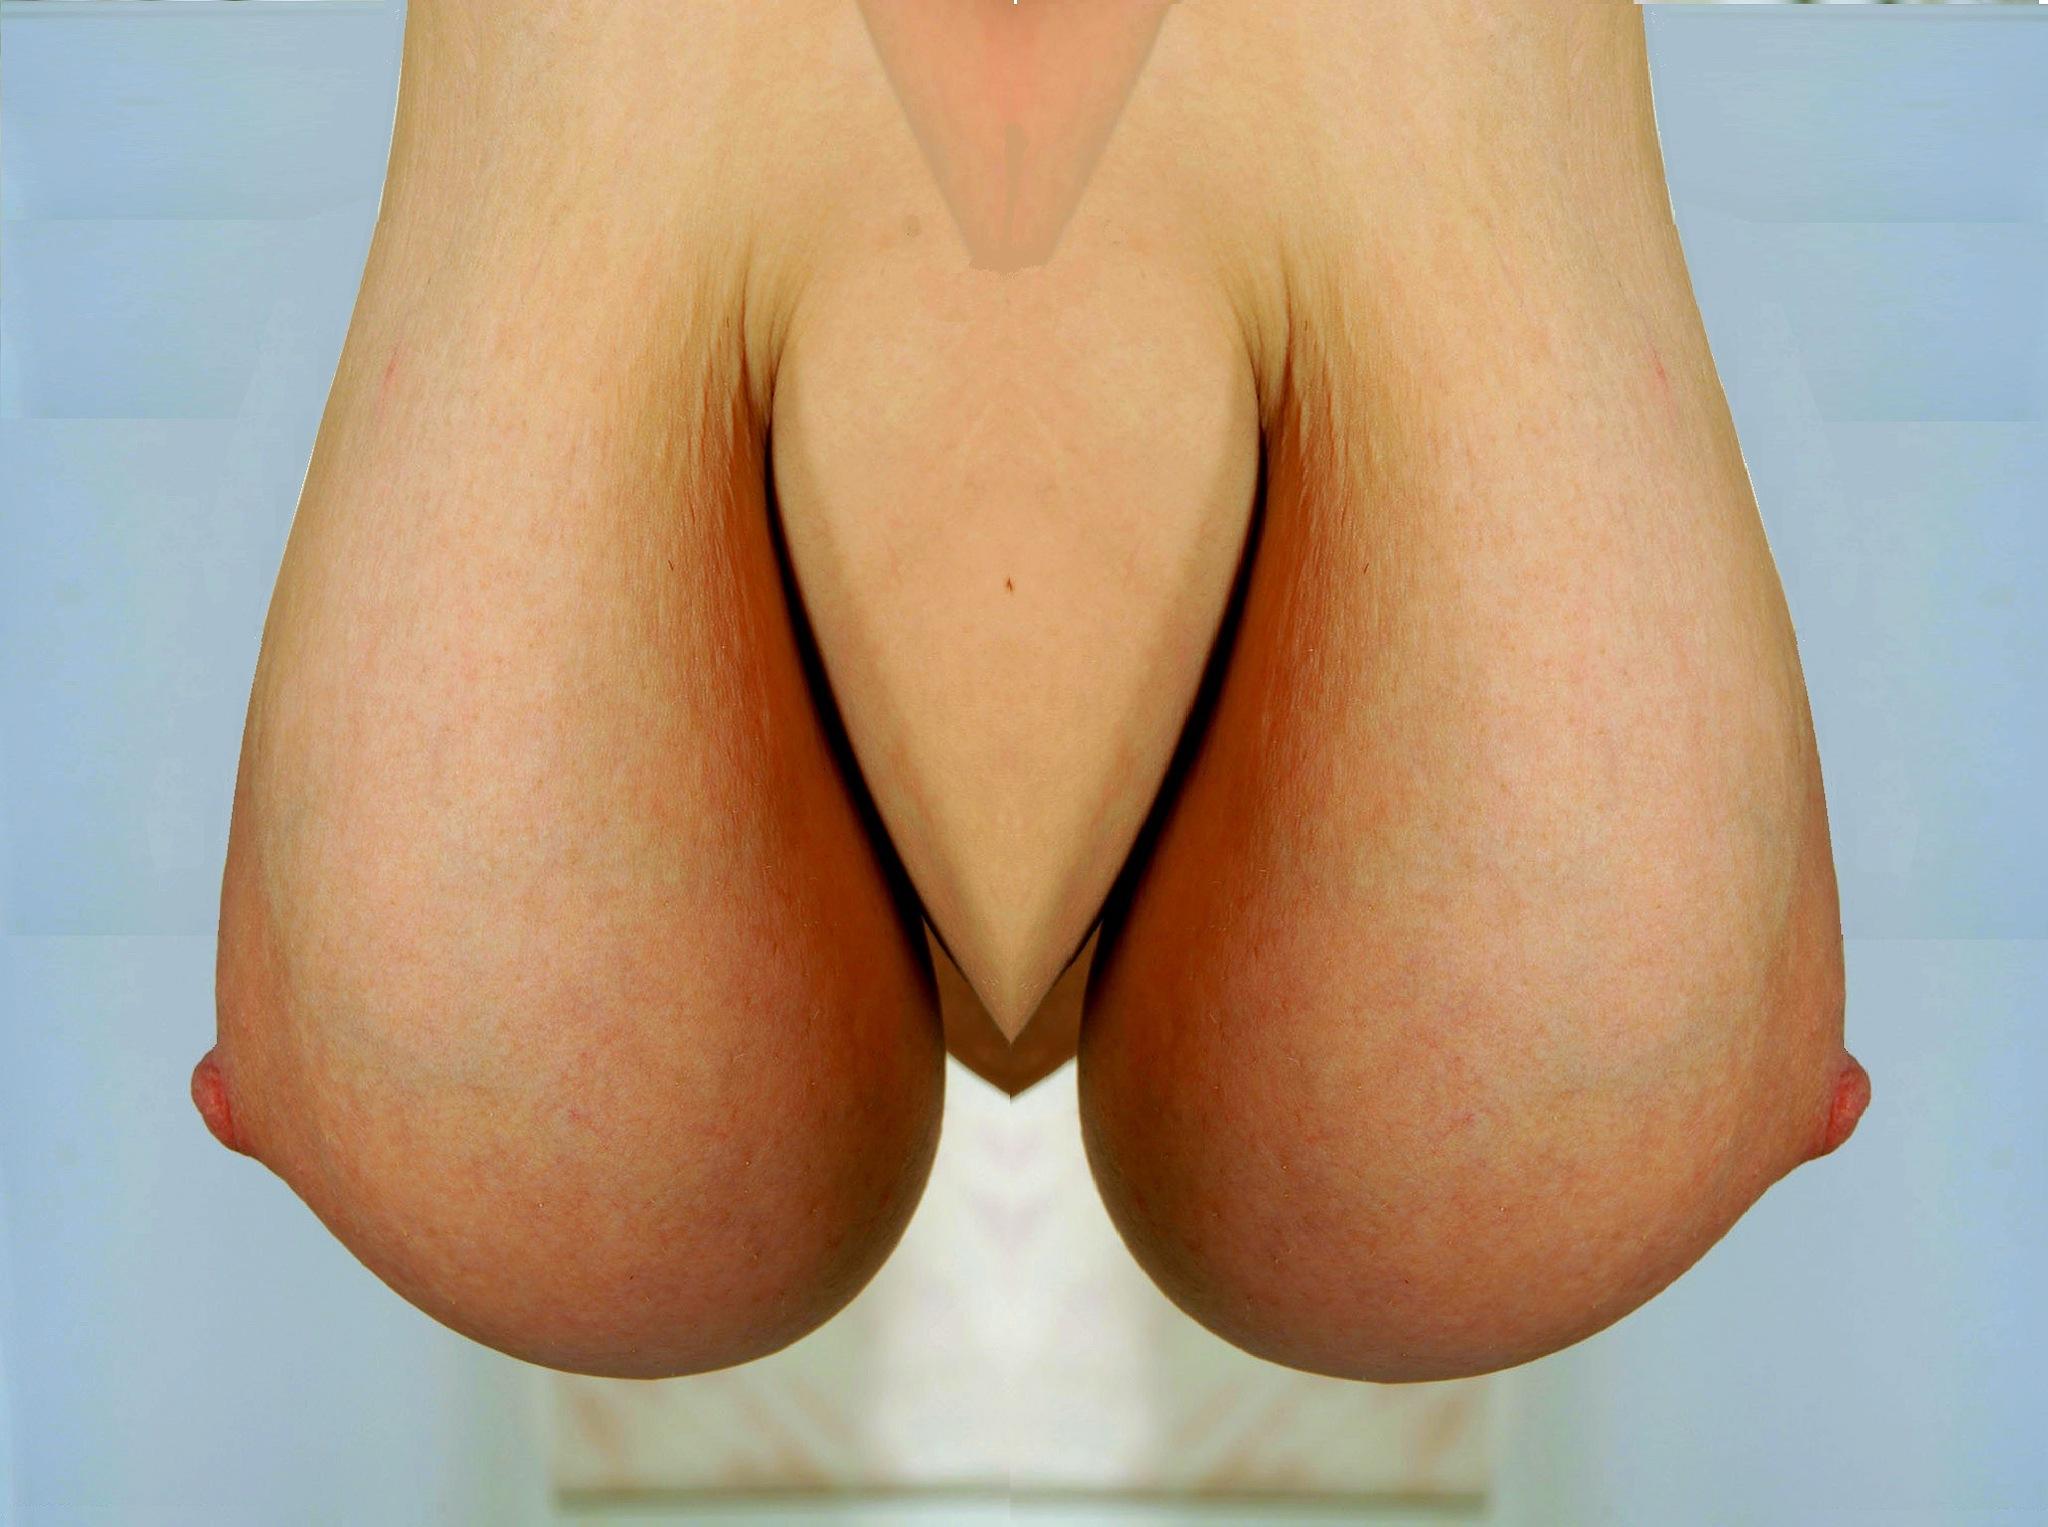 strange breasts by alan p jones